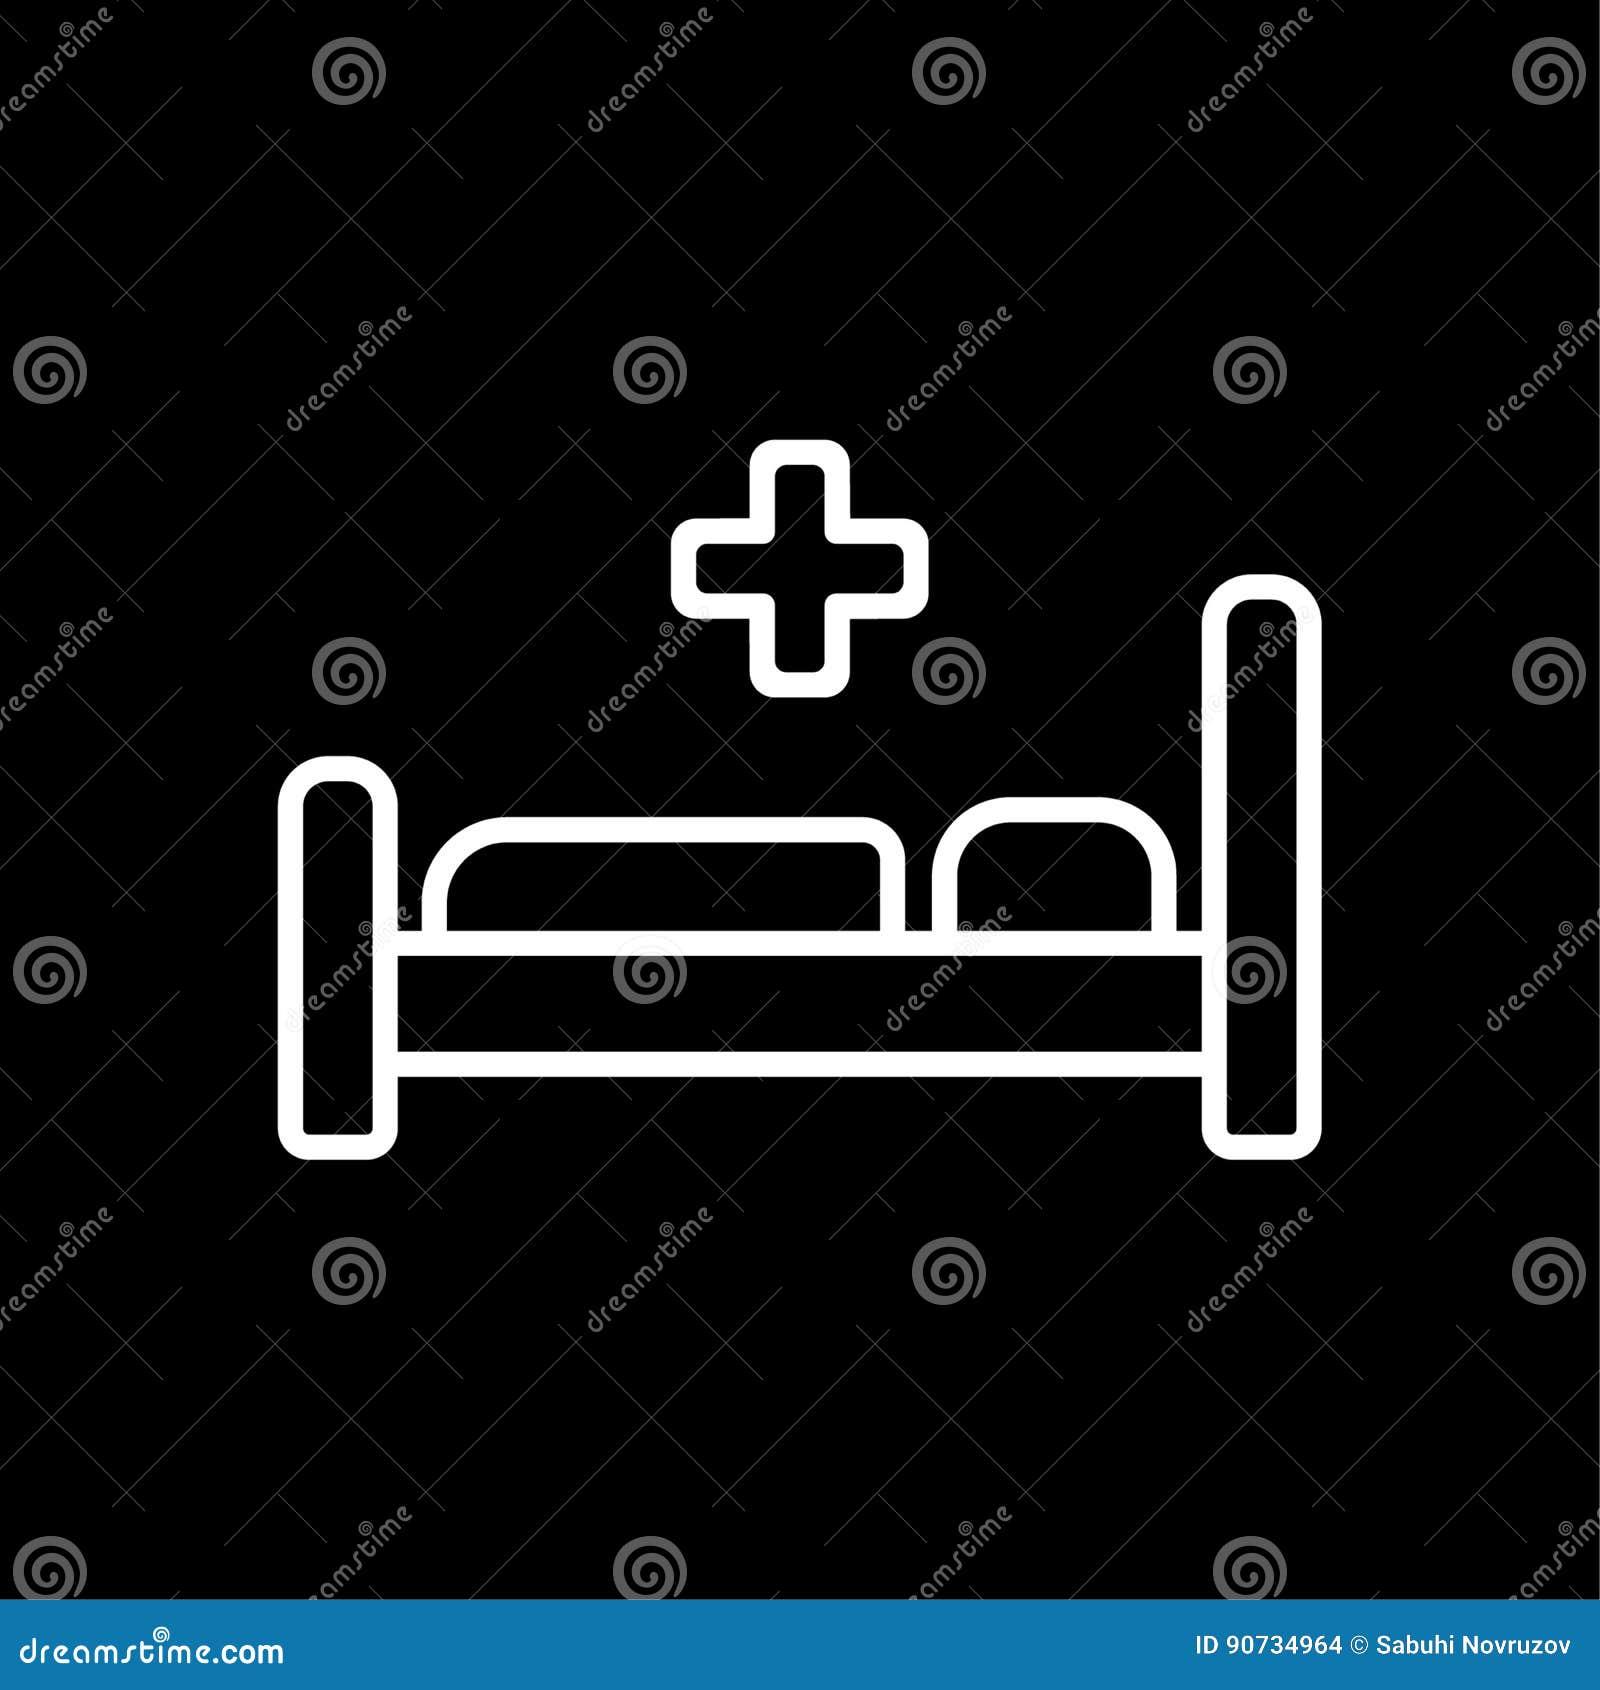 Cone da cama de hospital smbolo ilustrao lisa do vetor cone da cama de hospital smbolo ilustrao lisa do vetor eps 10 ccuart Gallery